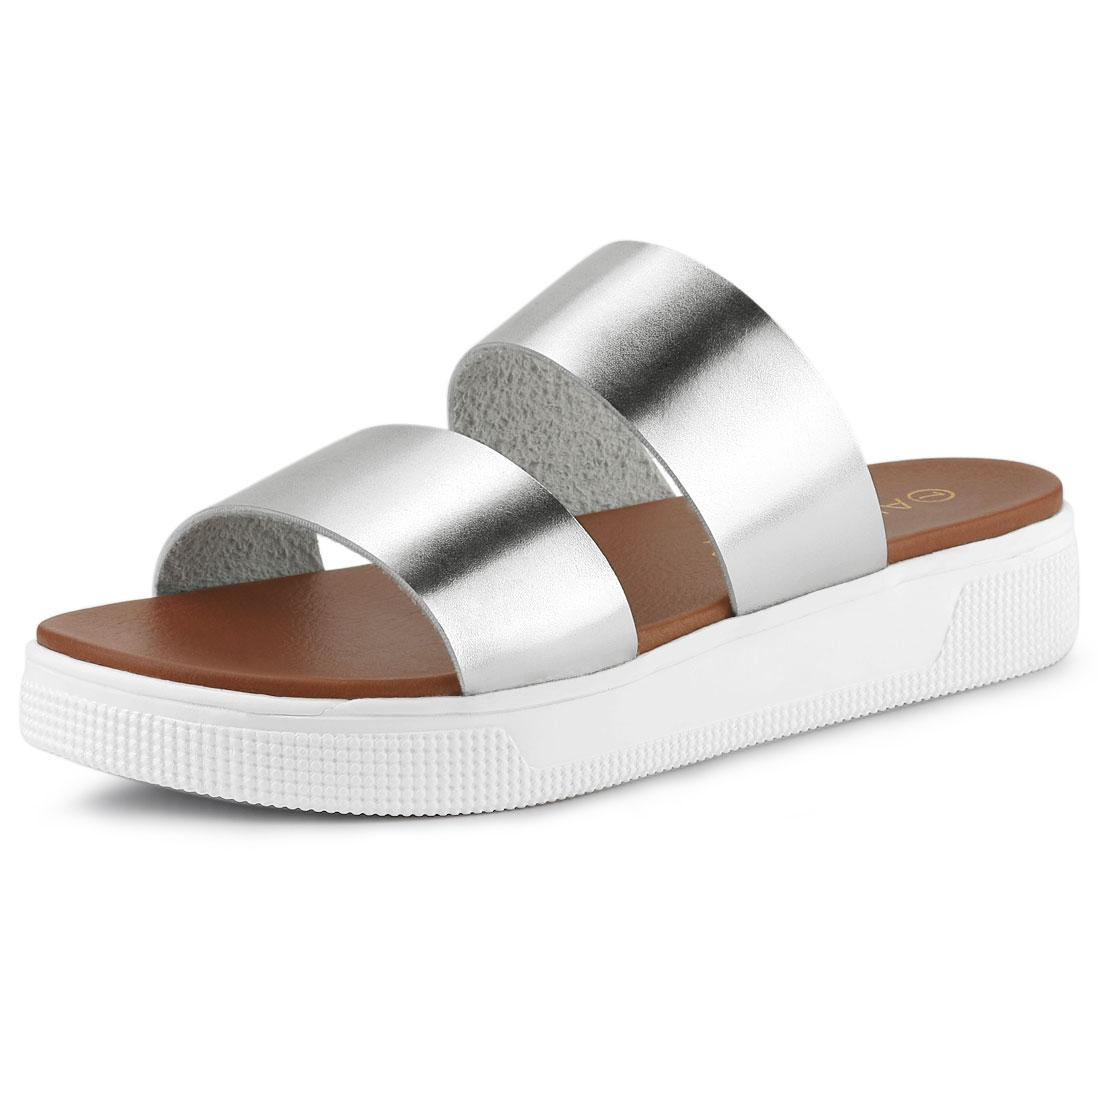 Allegra K Women's Open Toe Flatform Slides Sandals Silver US 6